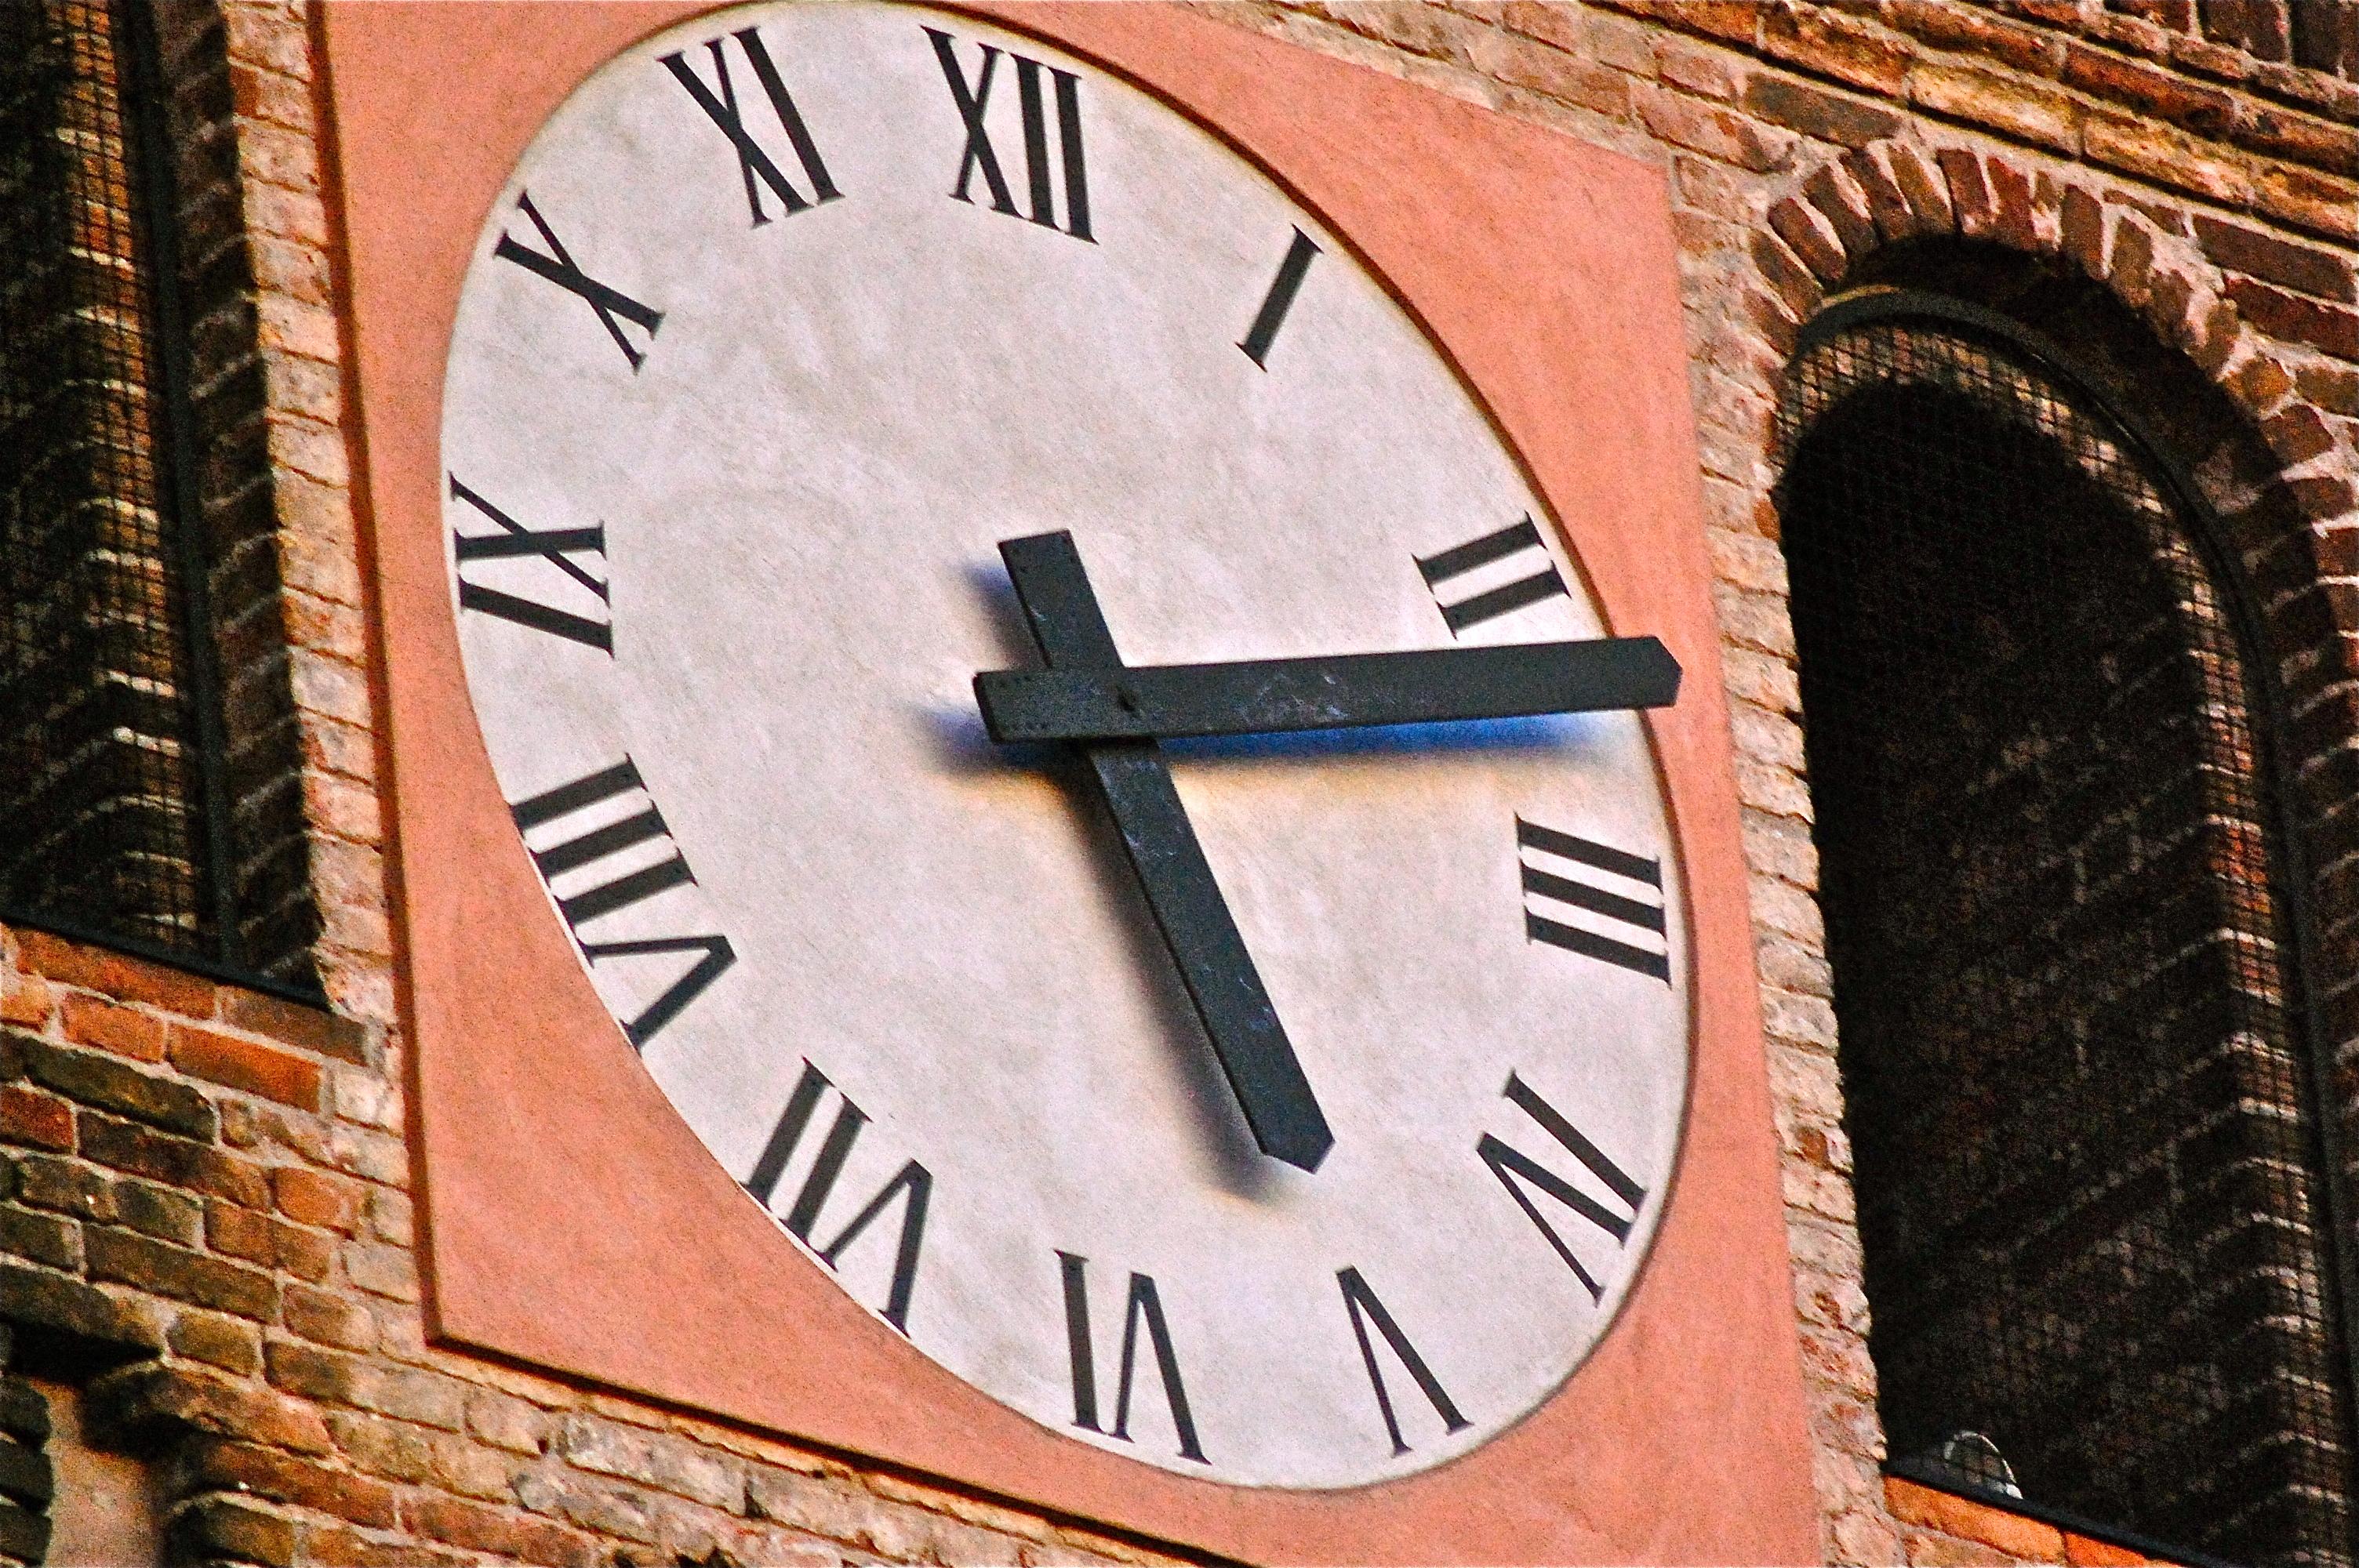 Clock Tower. Mozzanica (BG), Gennaio 2012